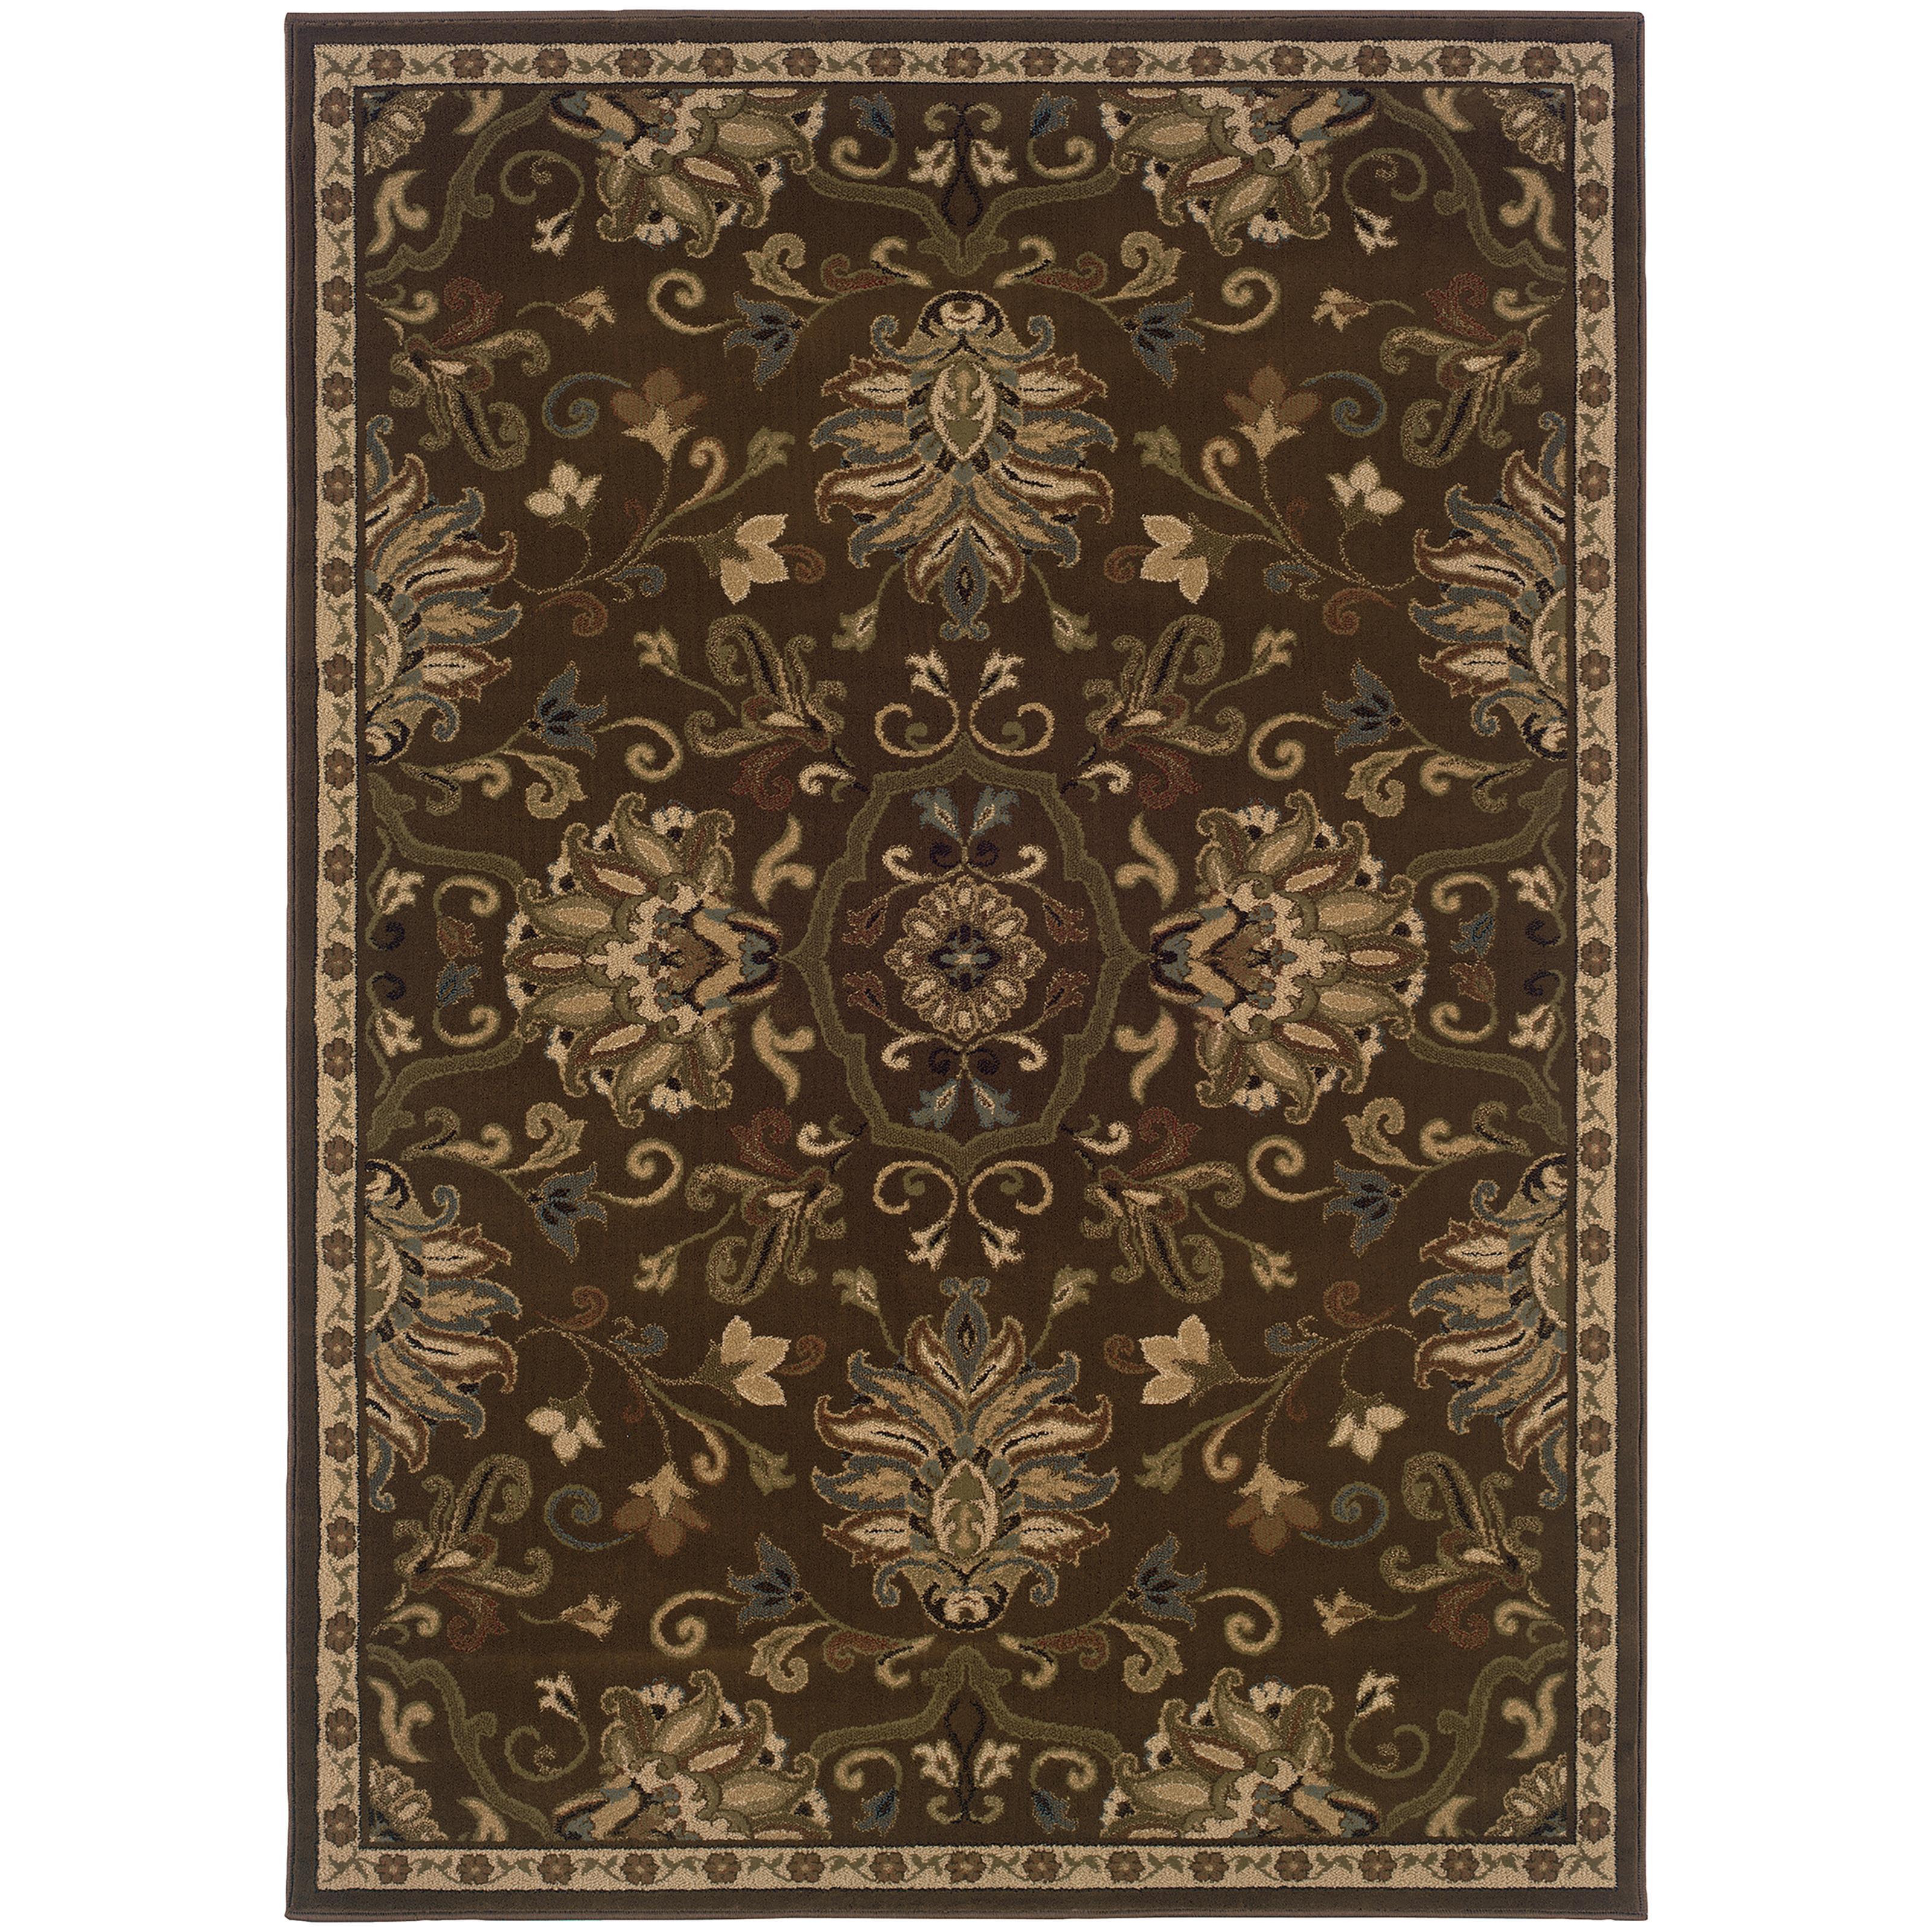 Oriental Weavers Hudson 10' X 13' Rug - Item Number: H042H1305396ST